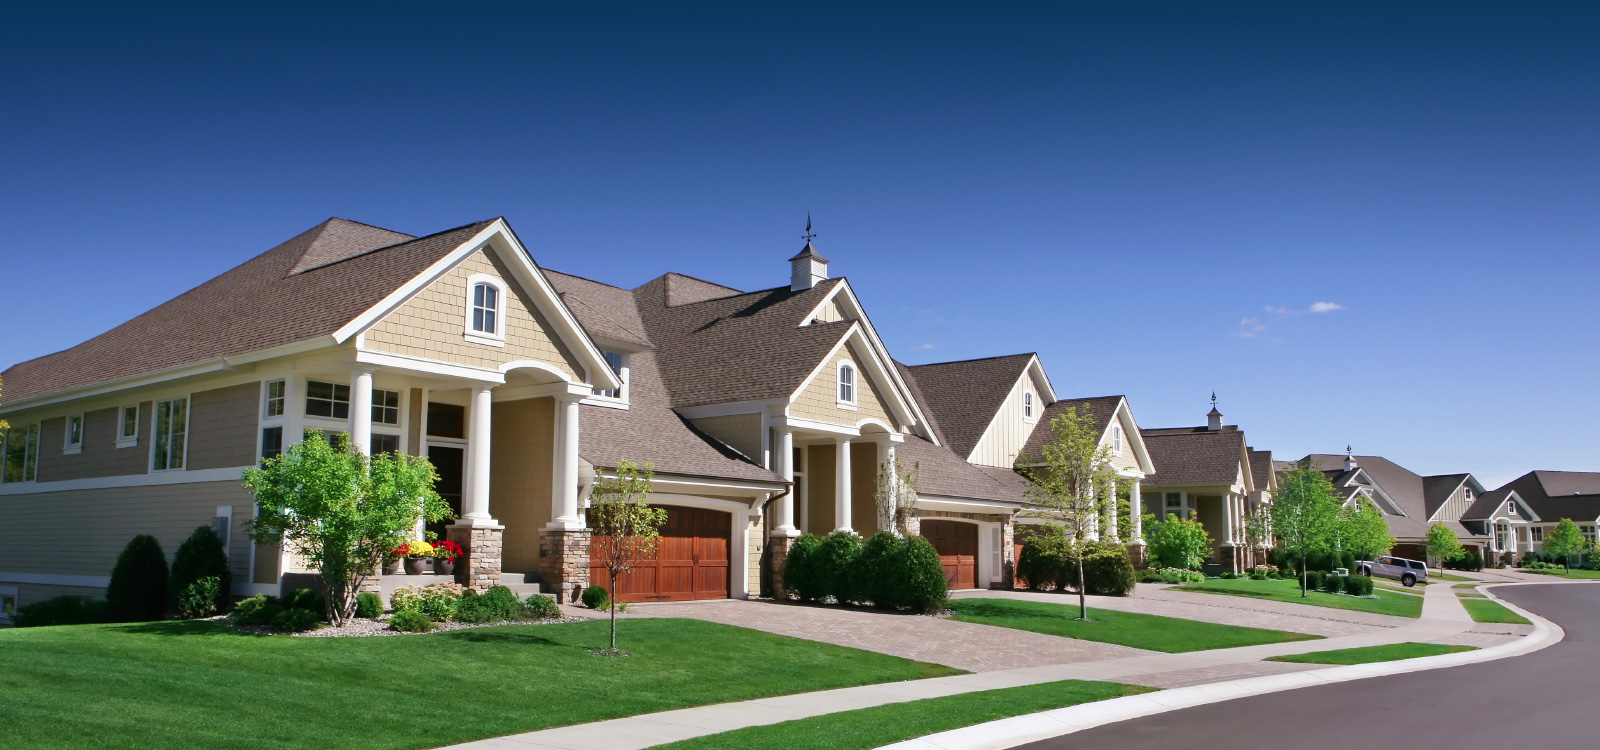 Home Inspection Checklist Mandeville